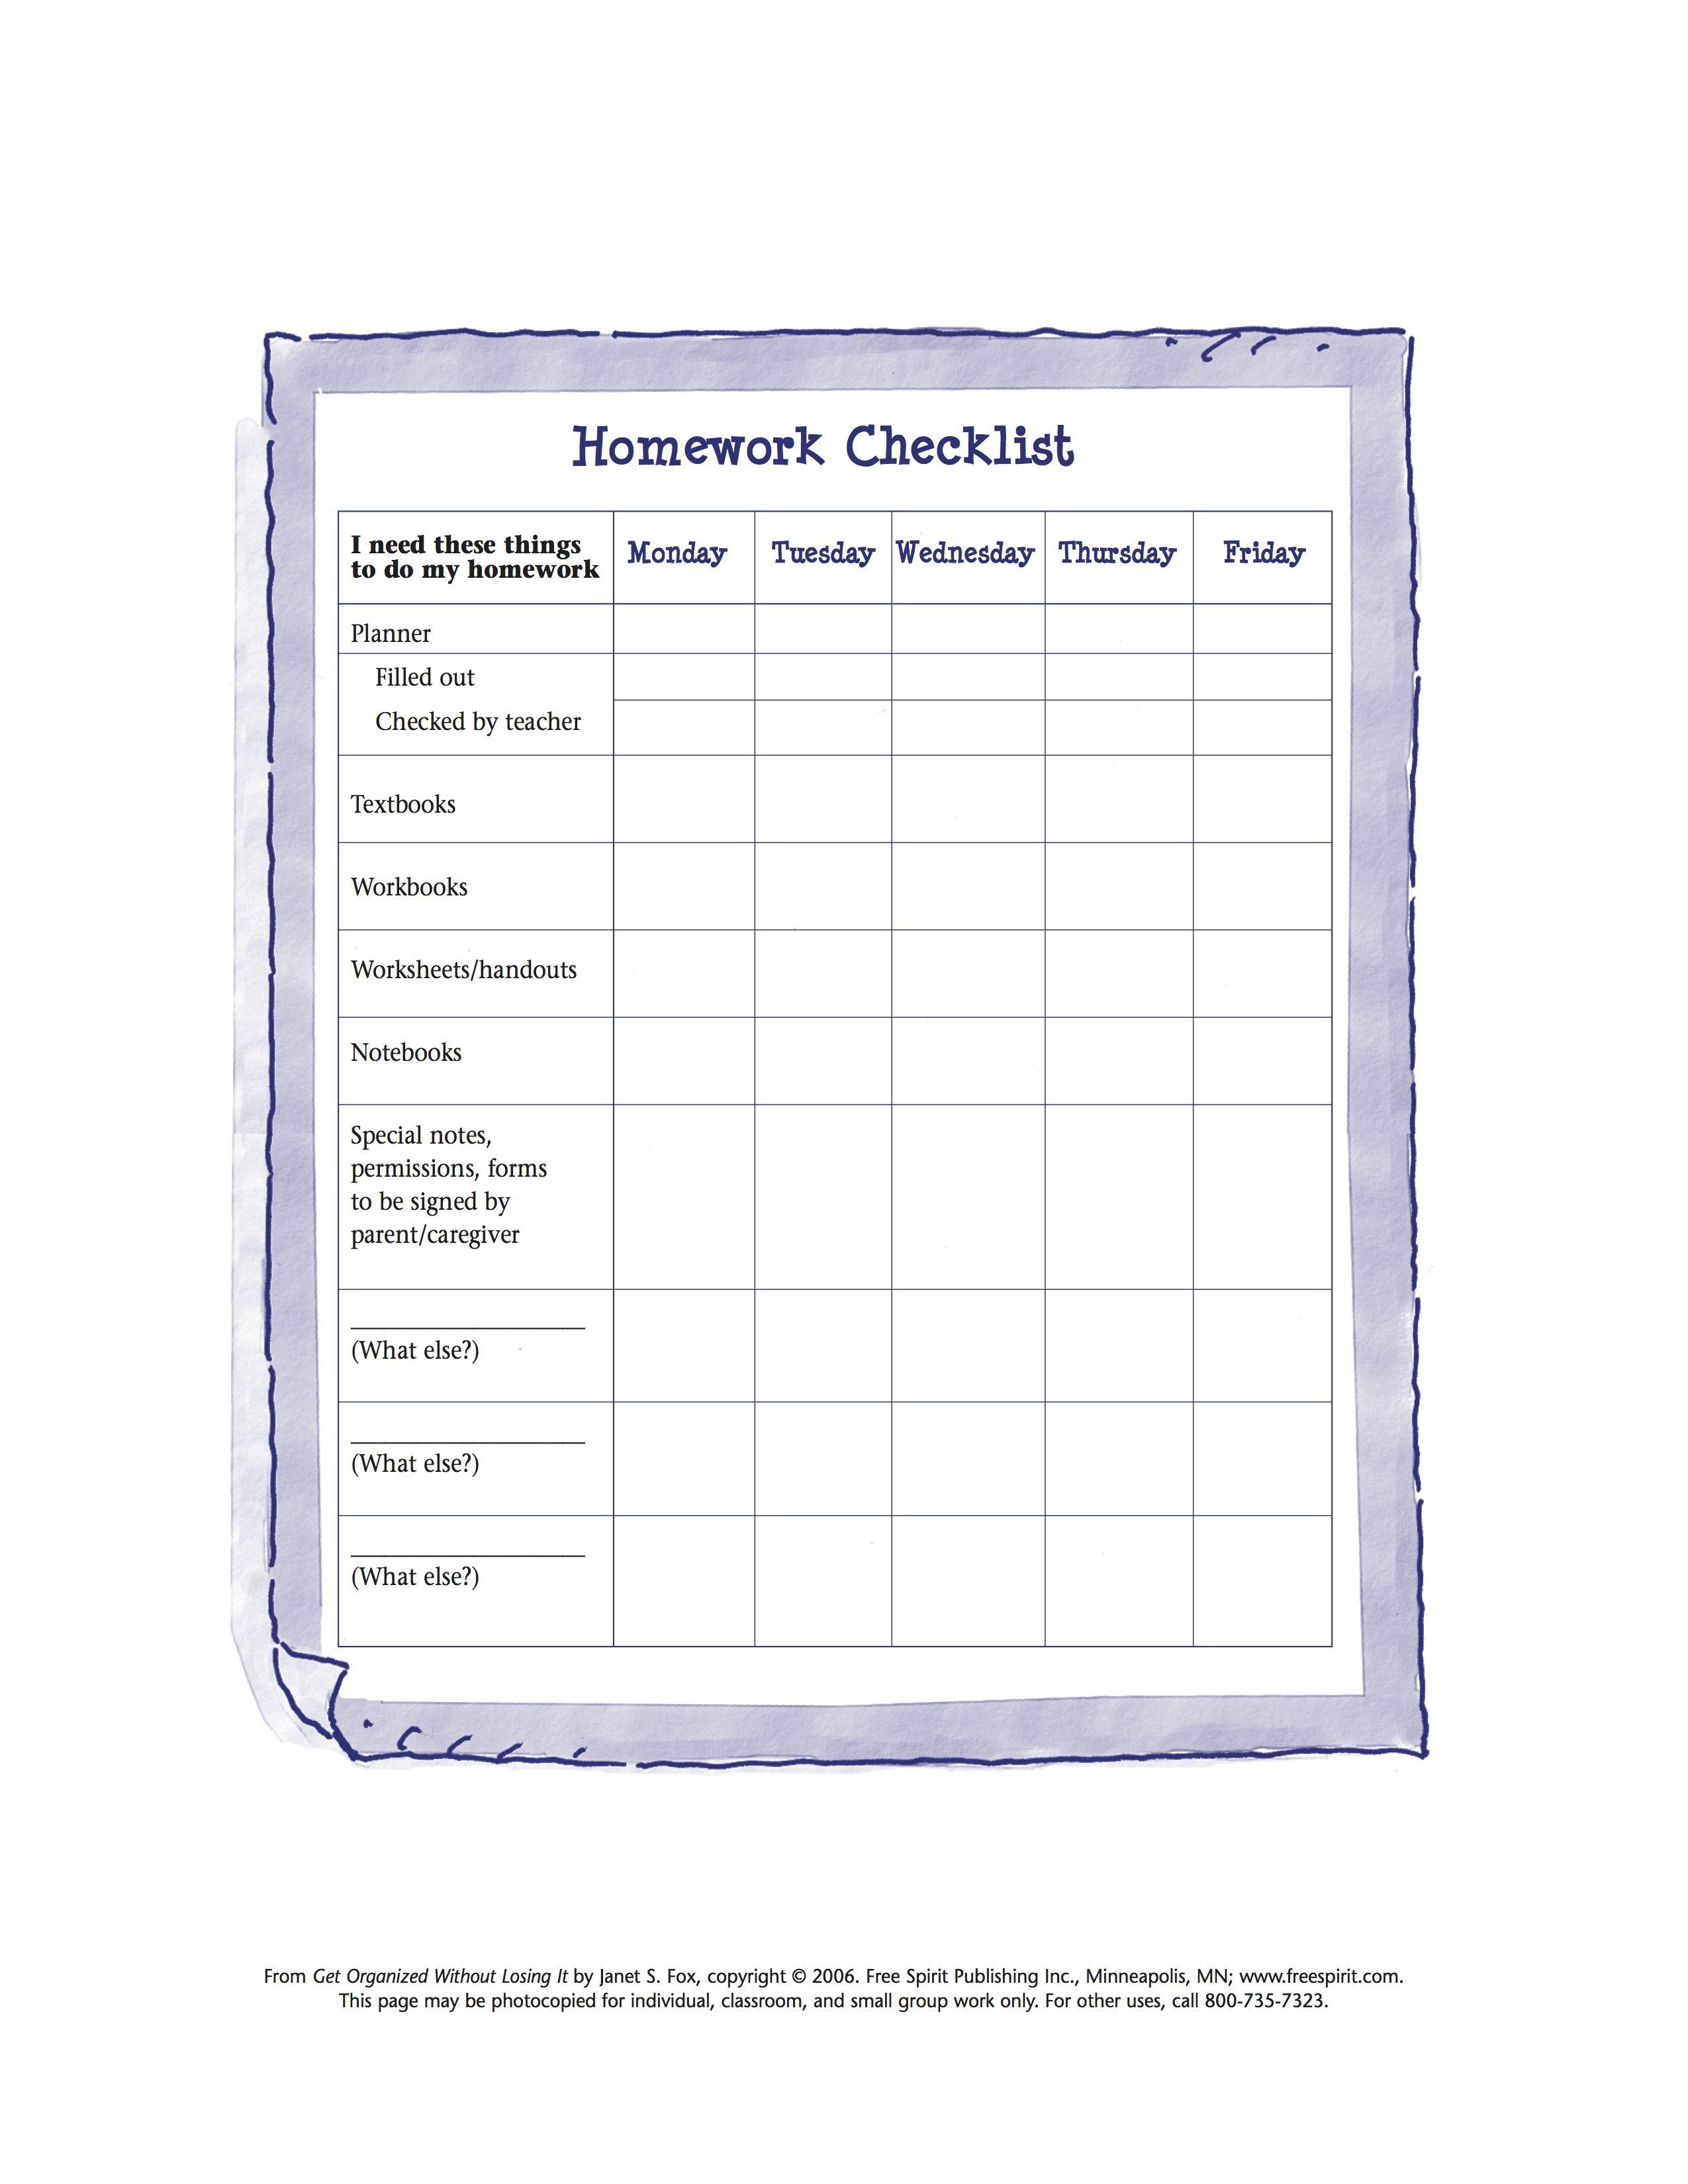 Free Printable Worksheet To Help Kids Organize Tools Needed For - Free Printable High School Worksheets